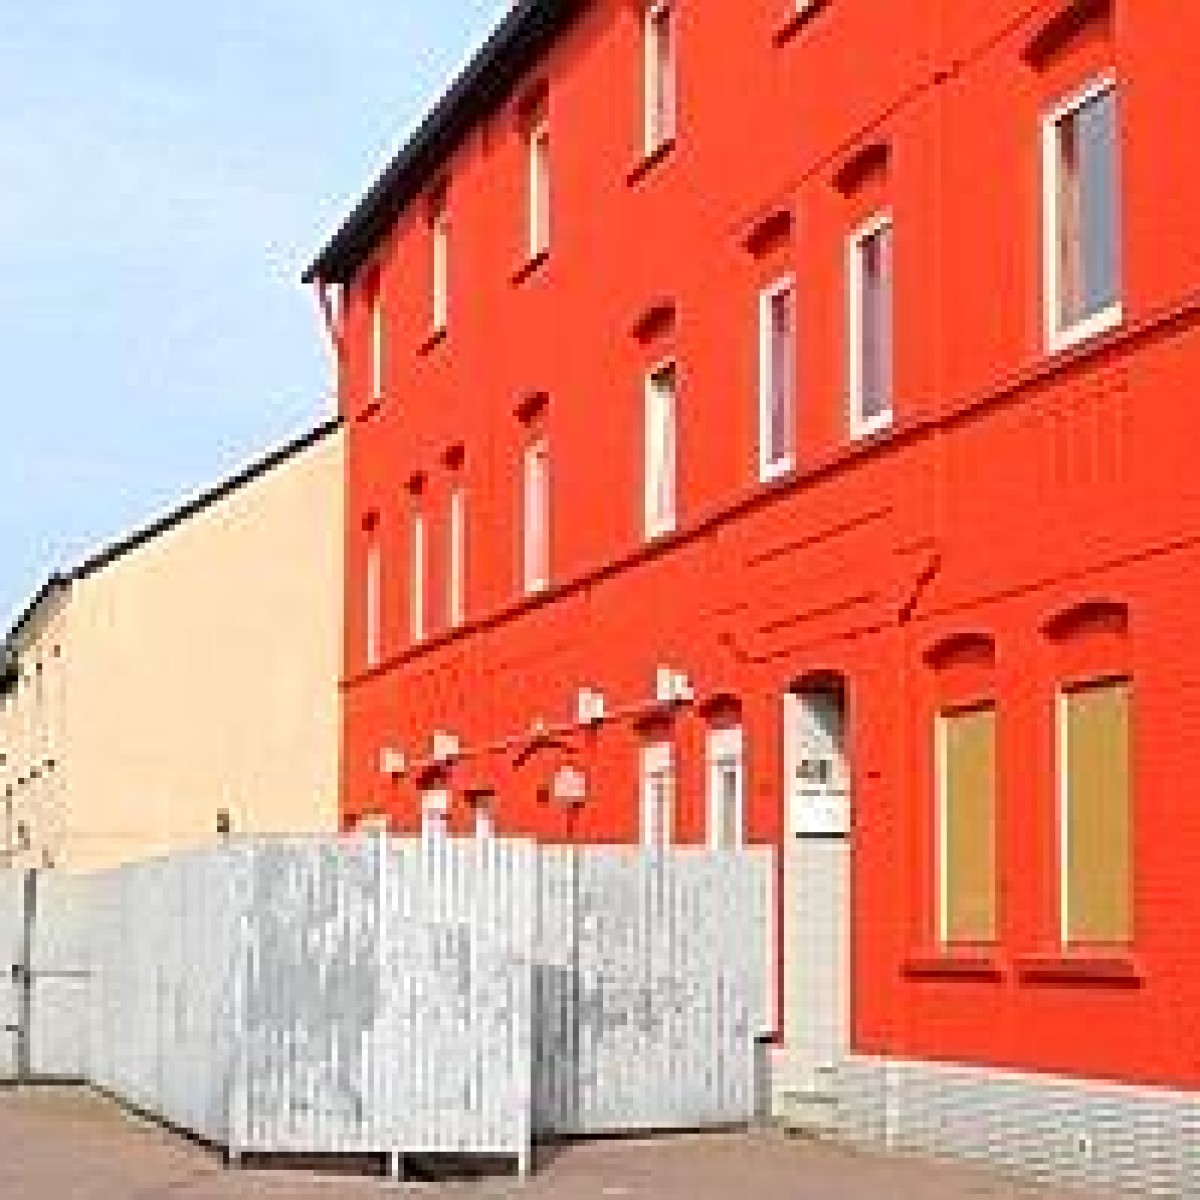 Oberhausen flaßhofstraße Herzlich Willkommen